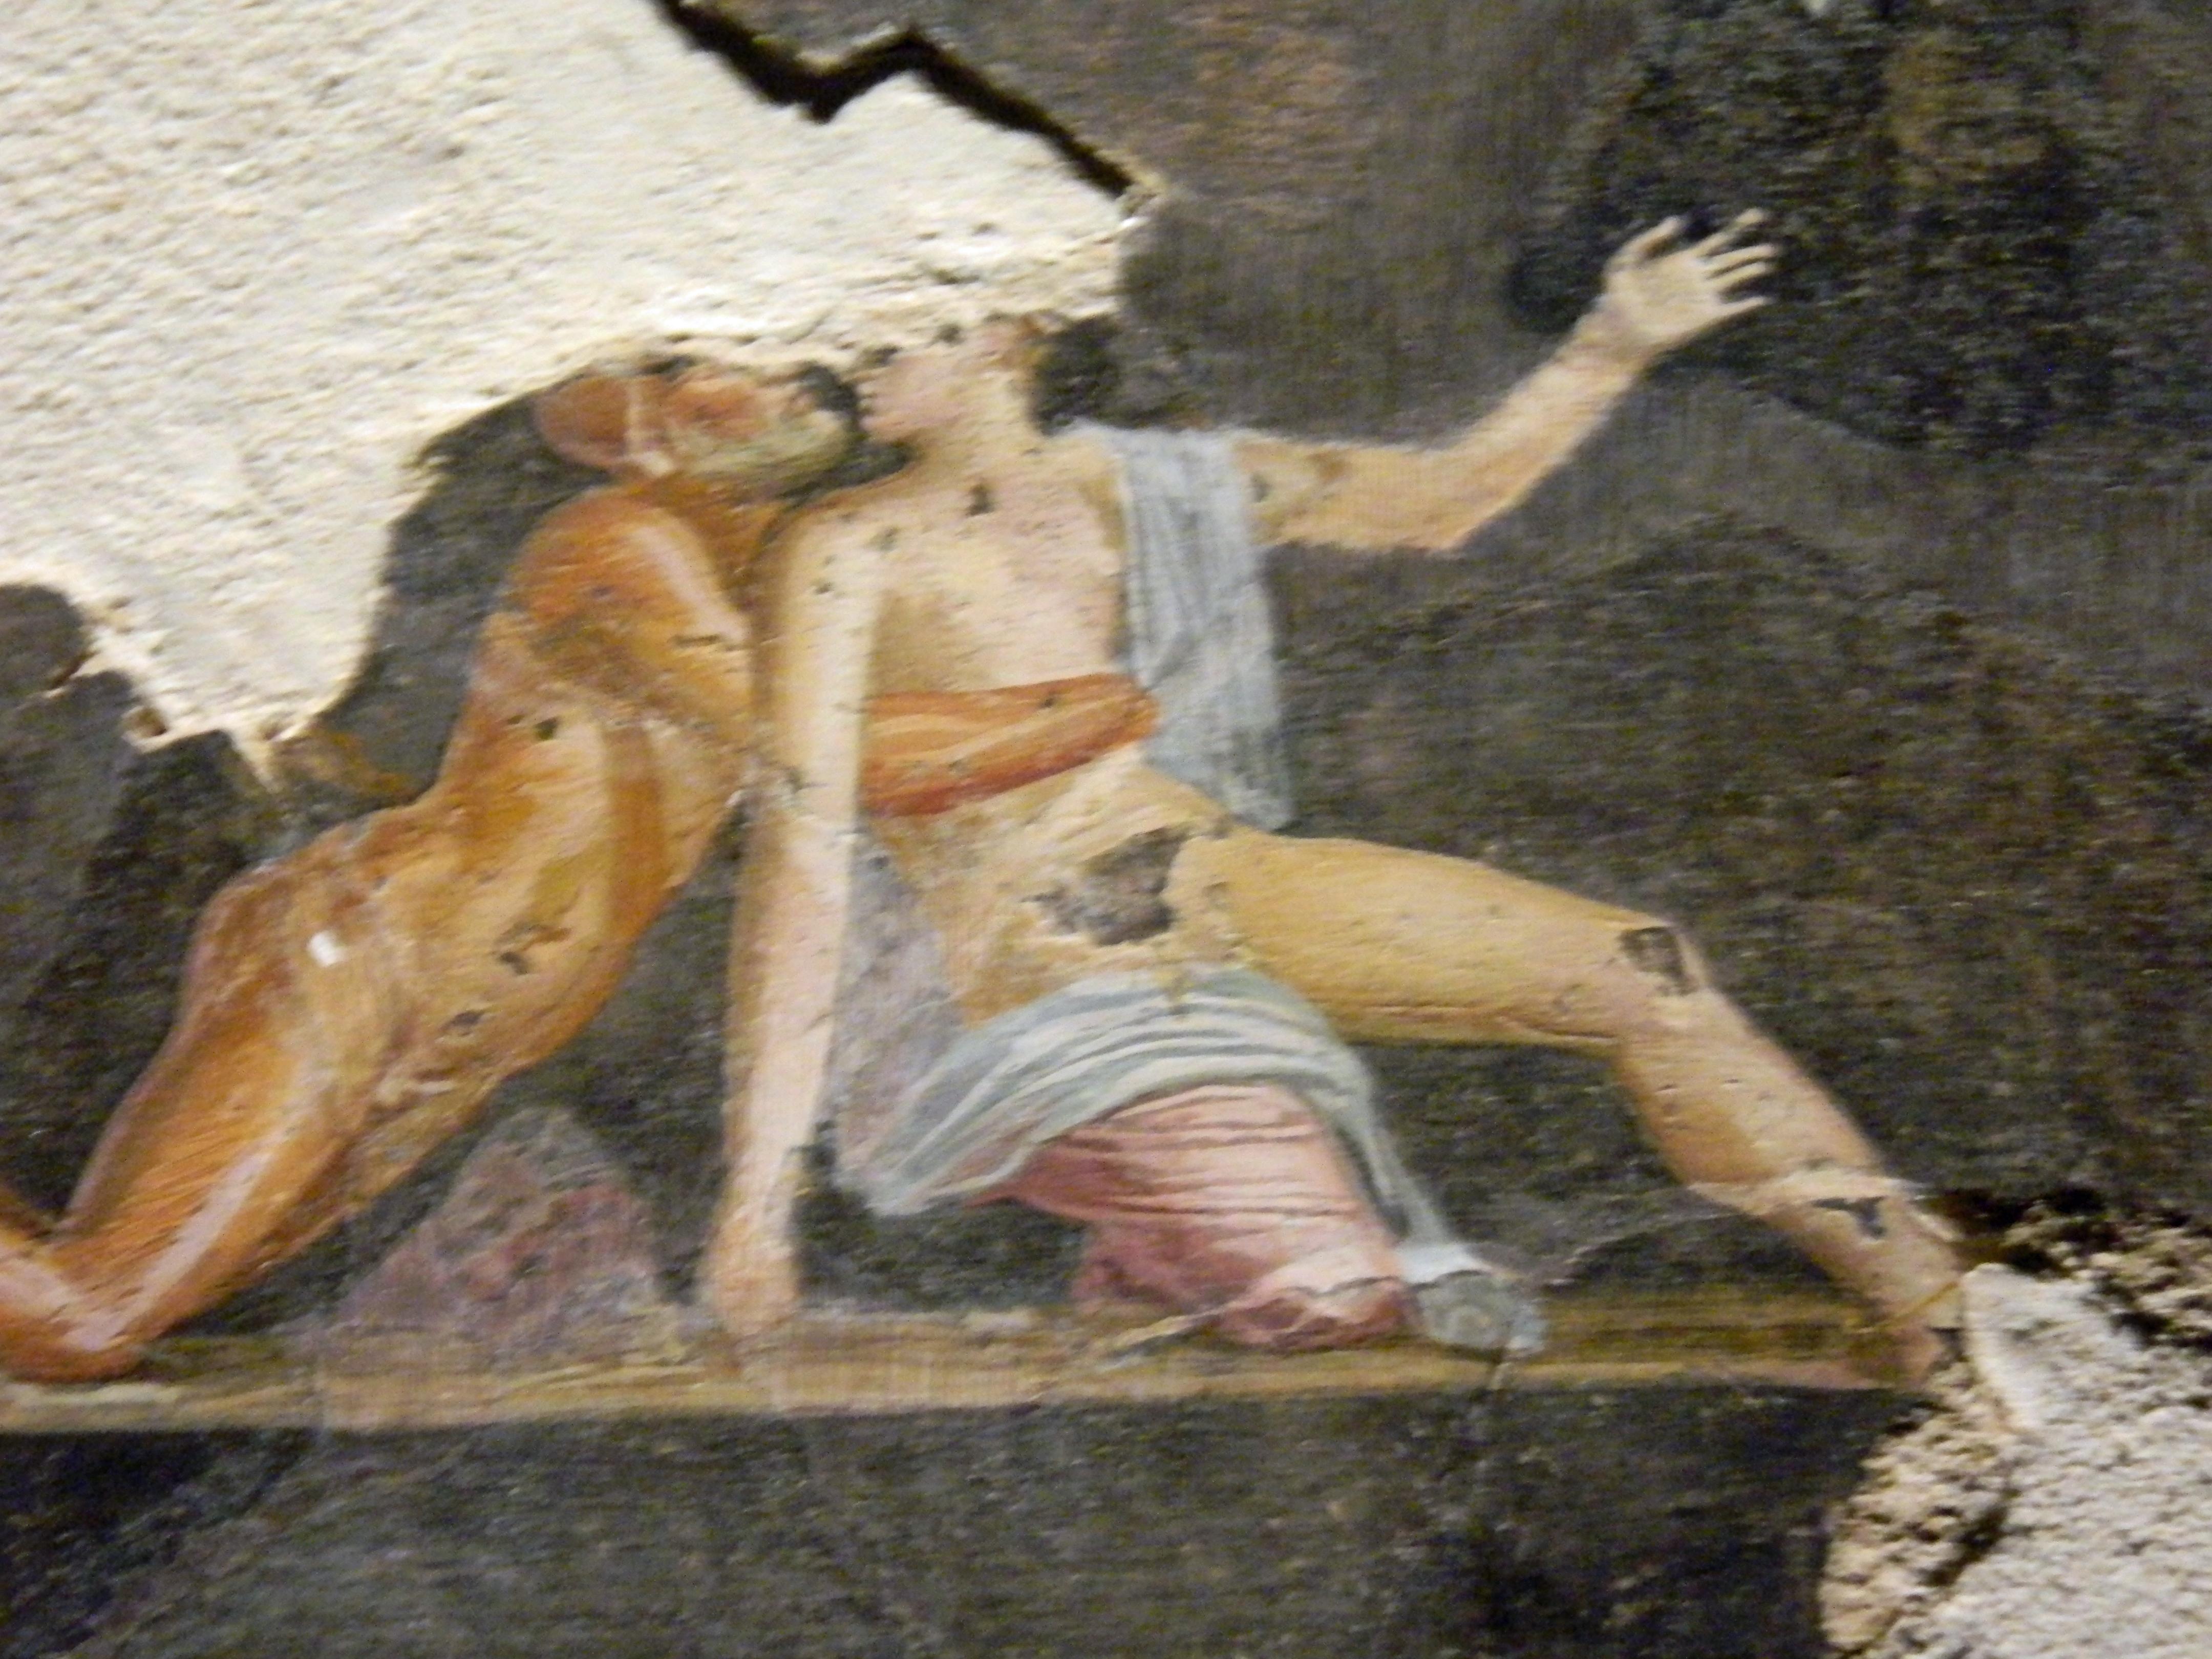 Baths in ancient rome